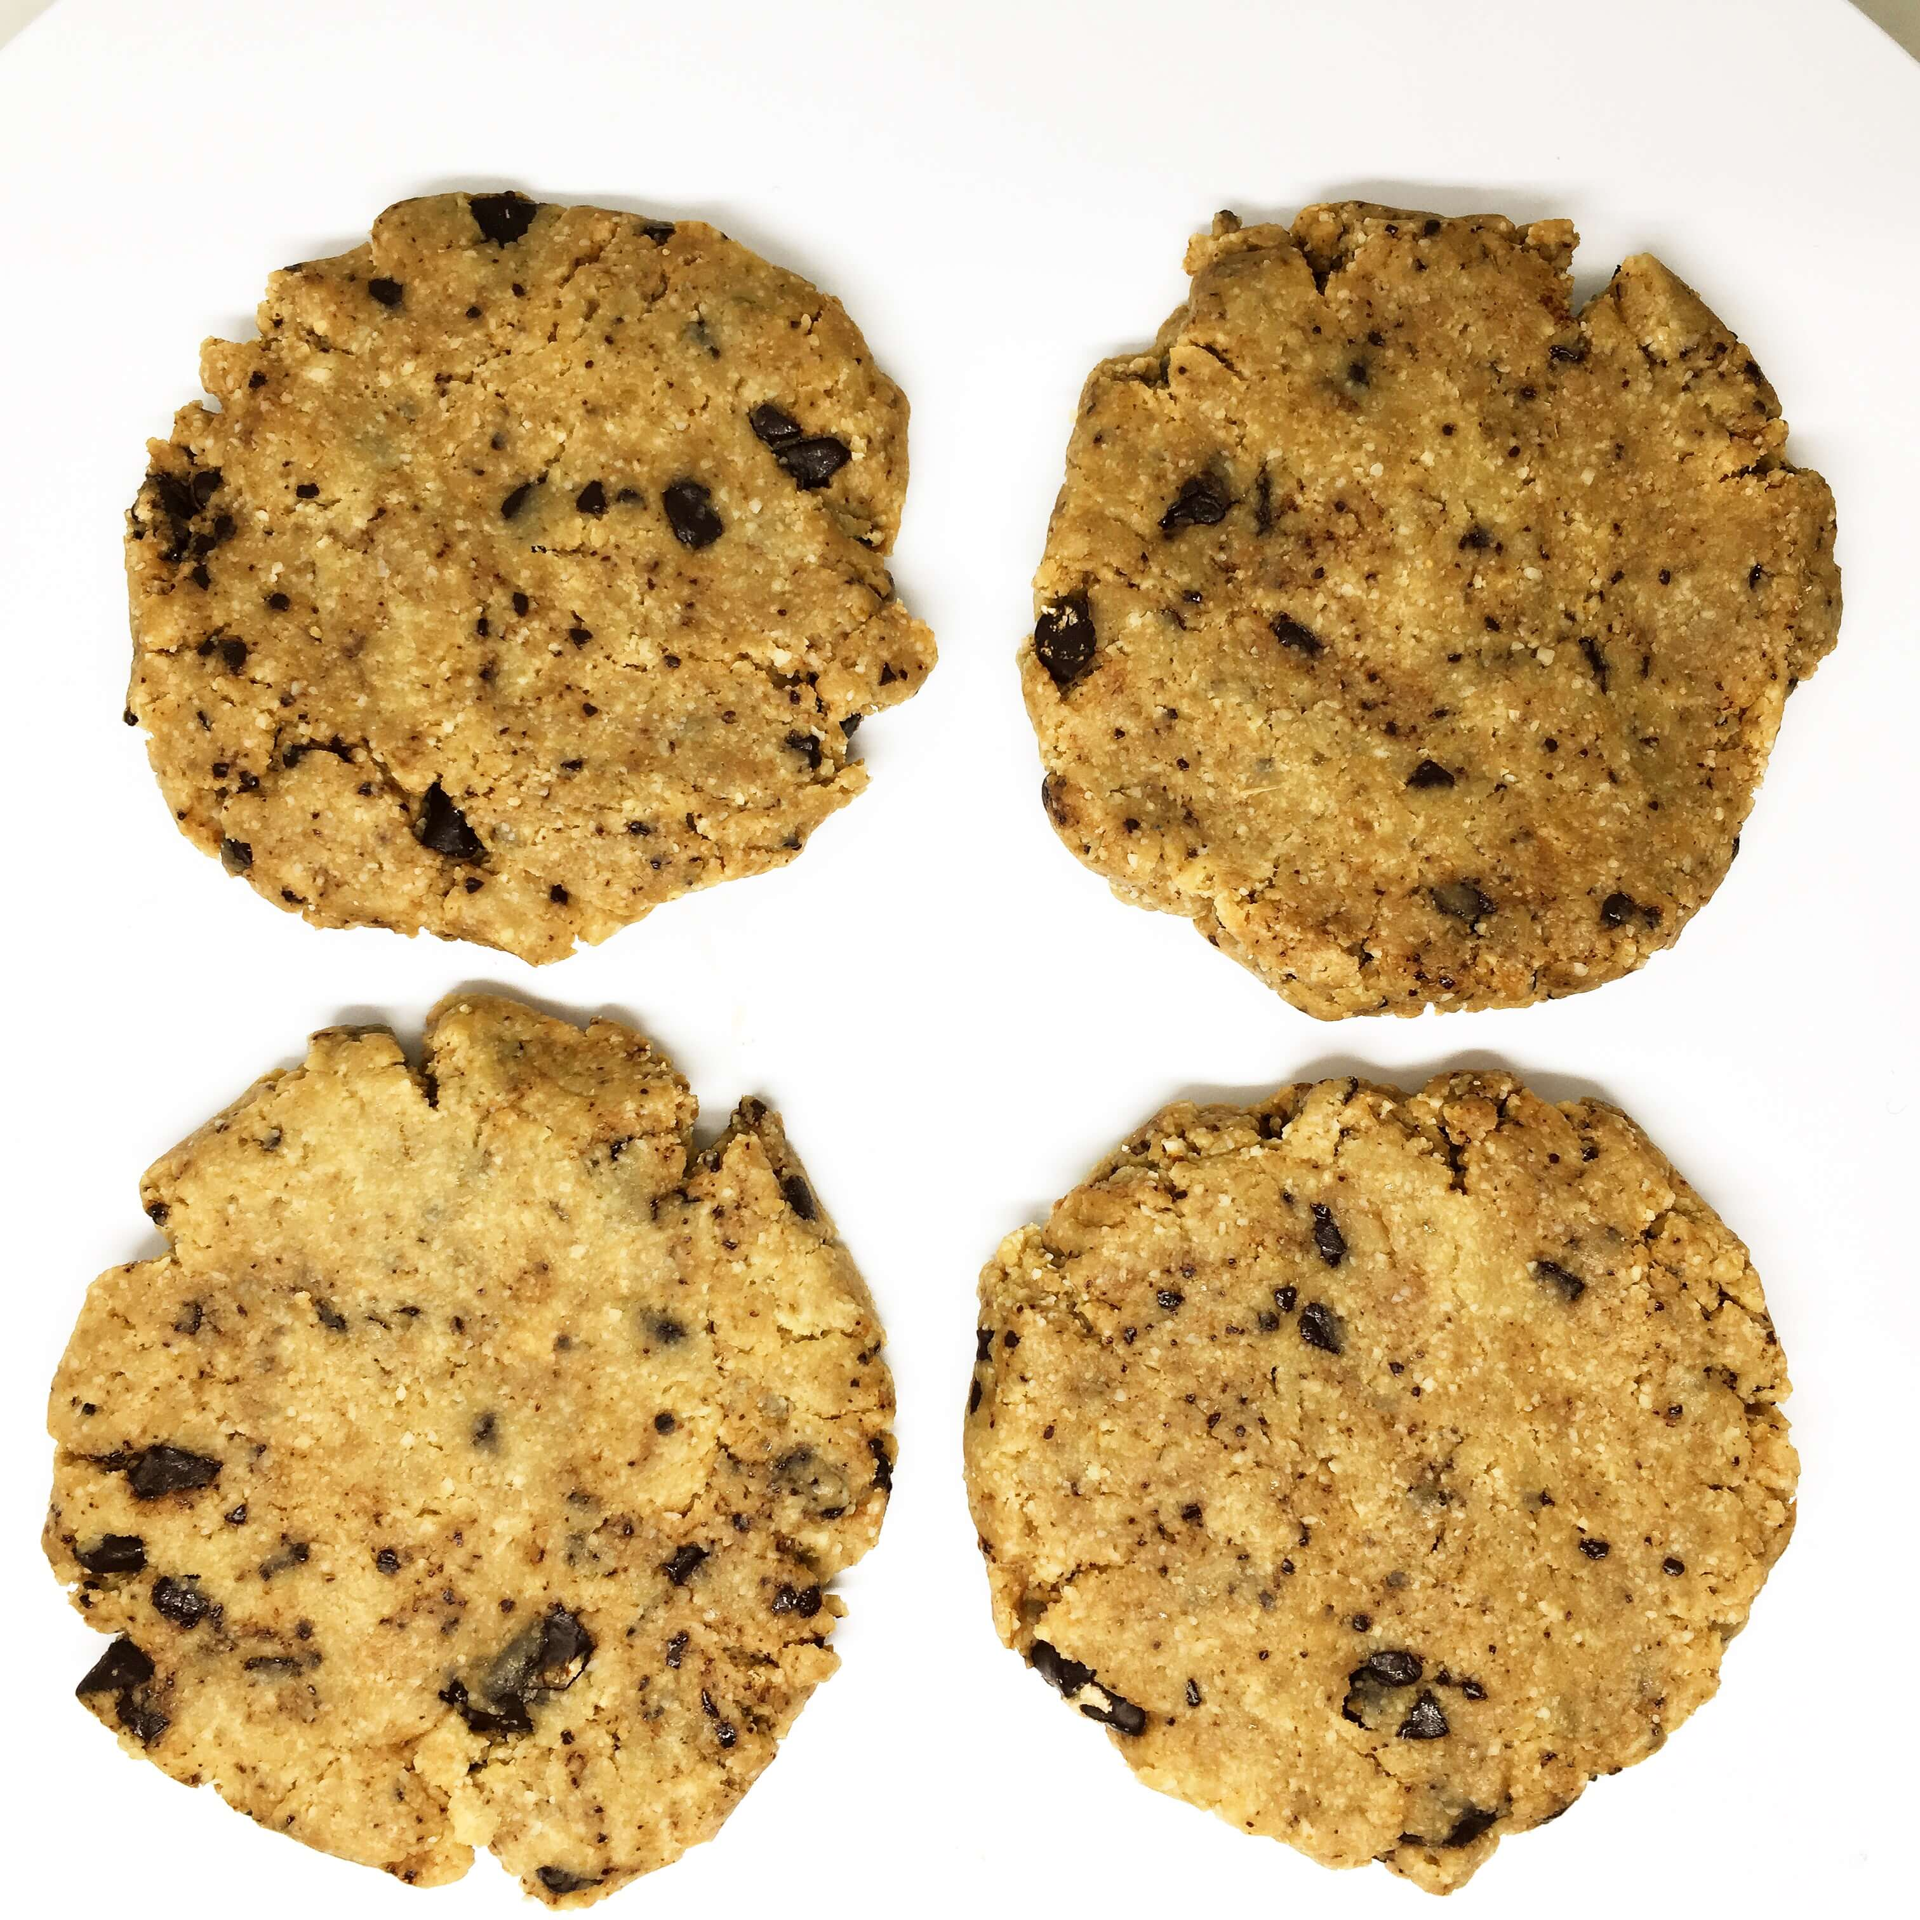 raw chocolate chip coockie - farina d'avena e cioccolate crudo by grezzo raw chocolate